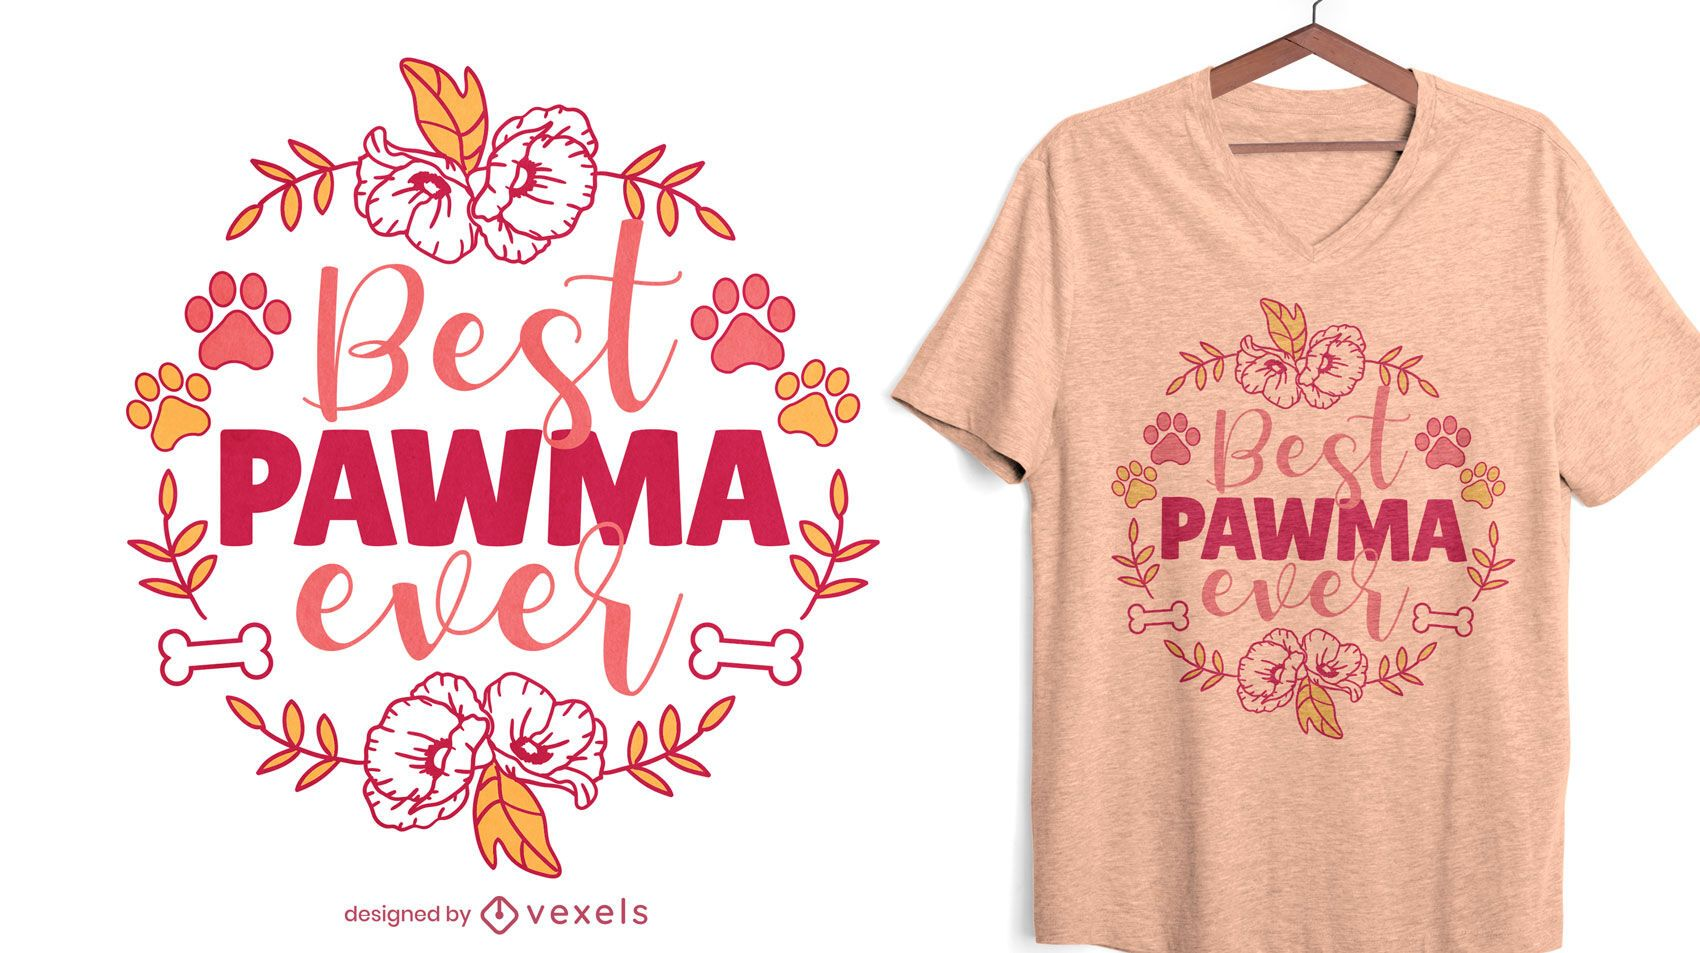 Dog grandma quote nature t-shirt design